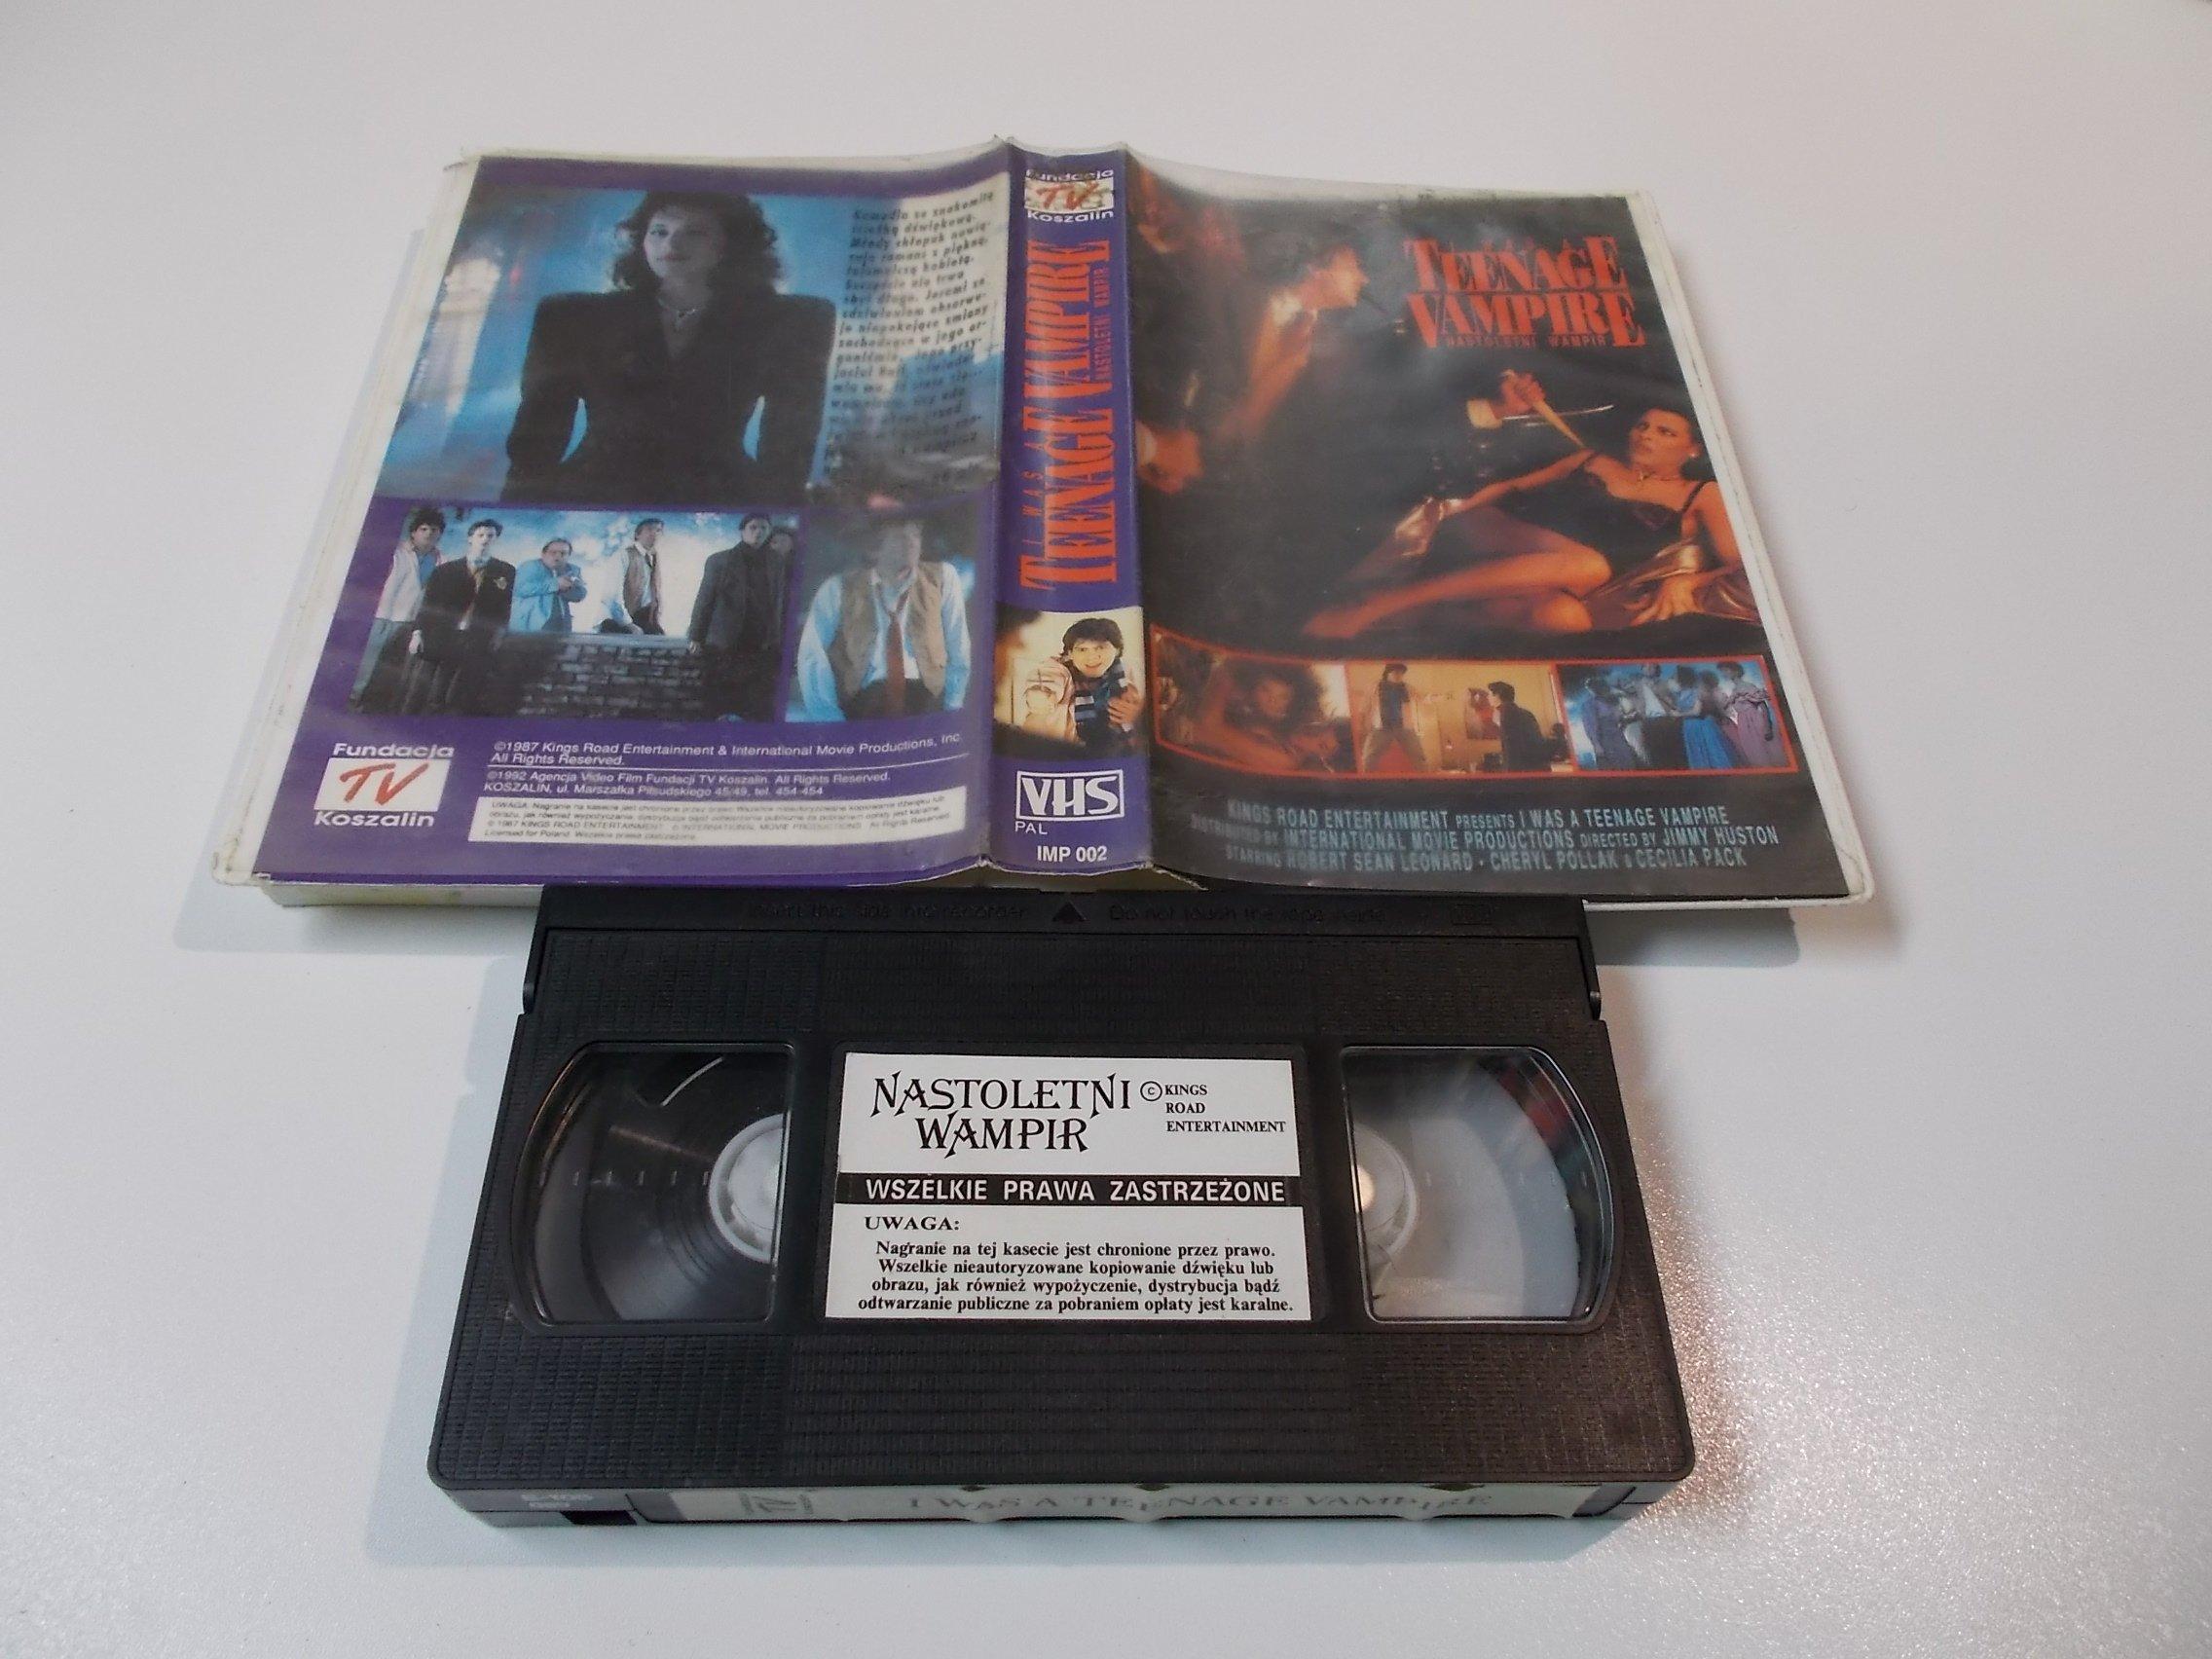 NASTOLETNI WAMPIR - kaseta Video VHS - 1434 Sklep